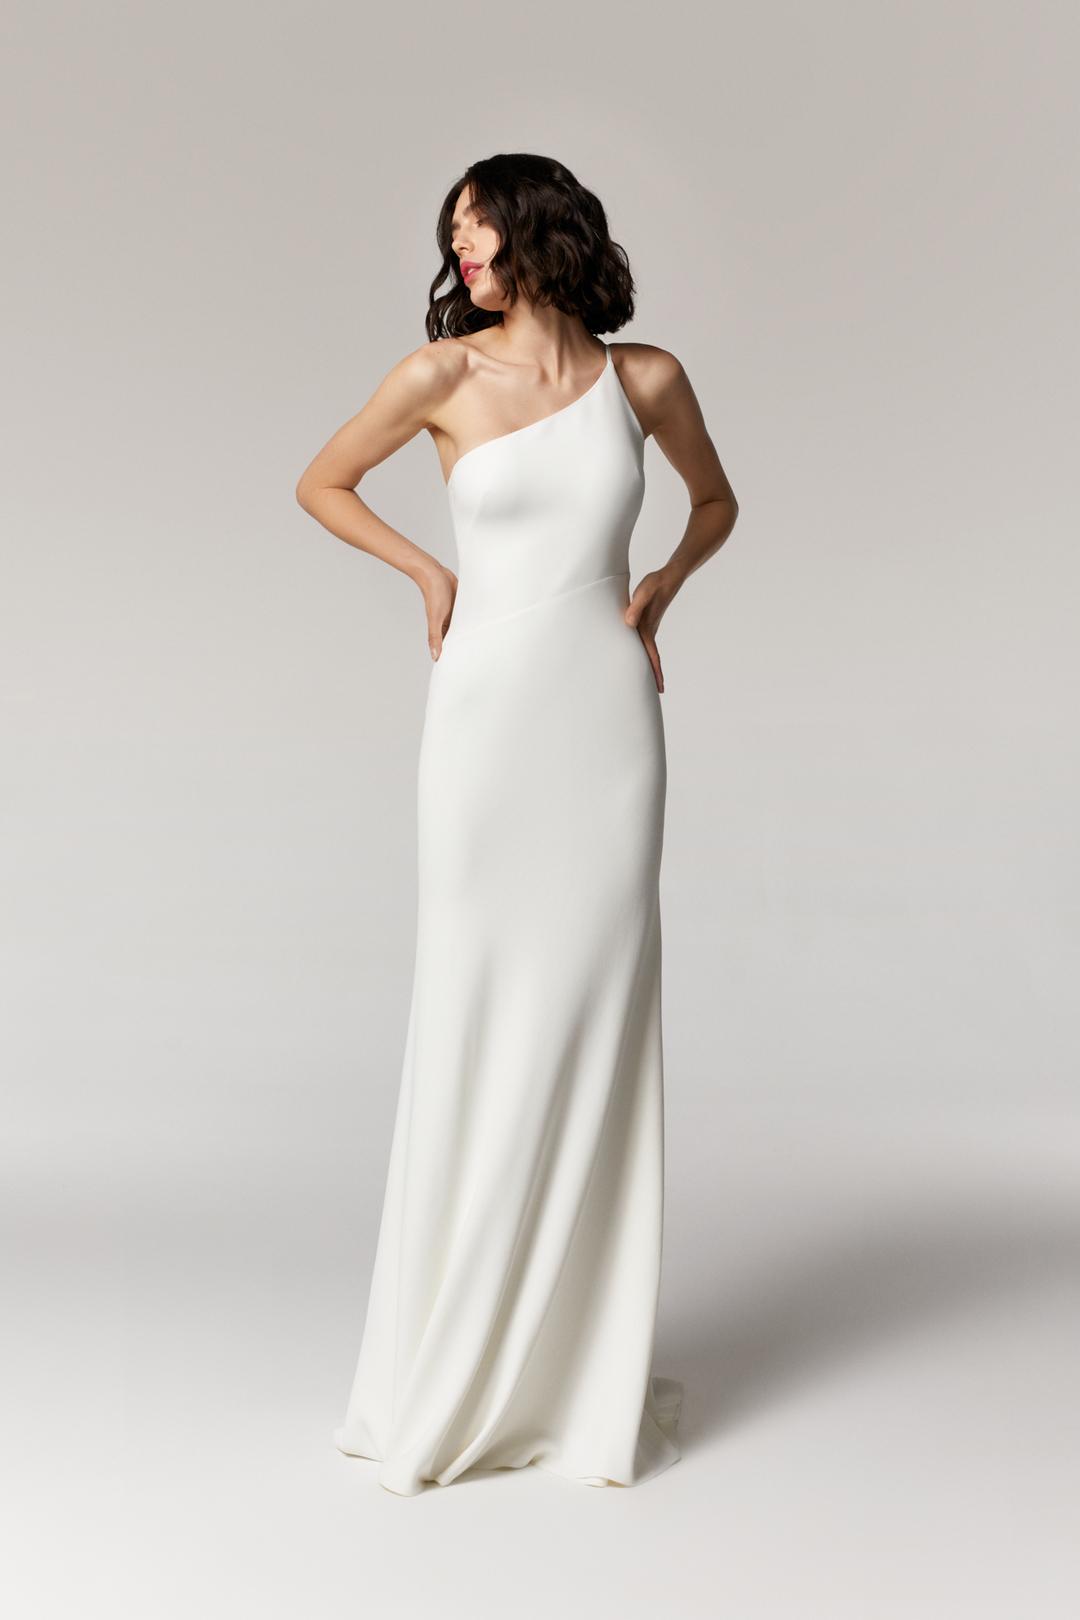 triss dress photo